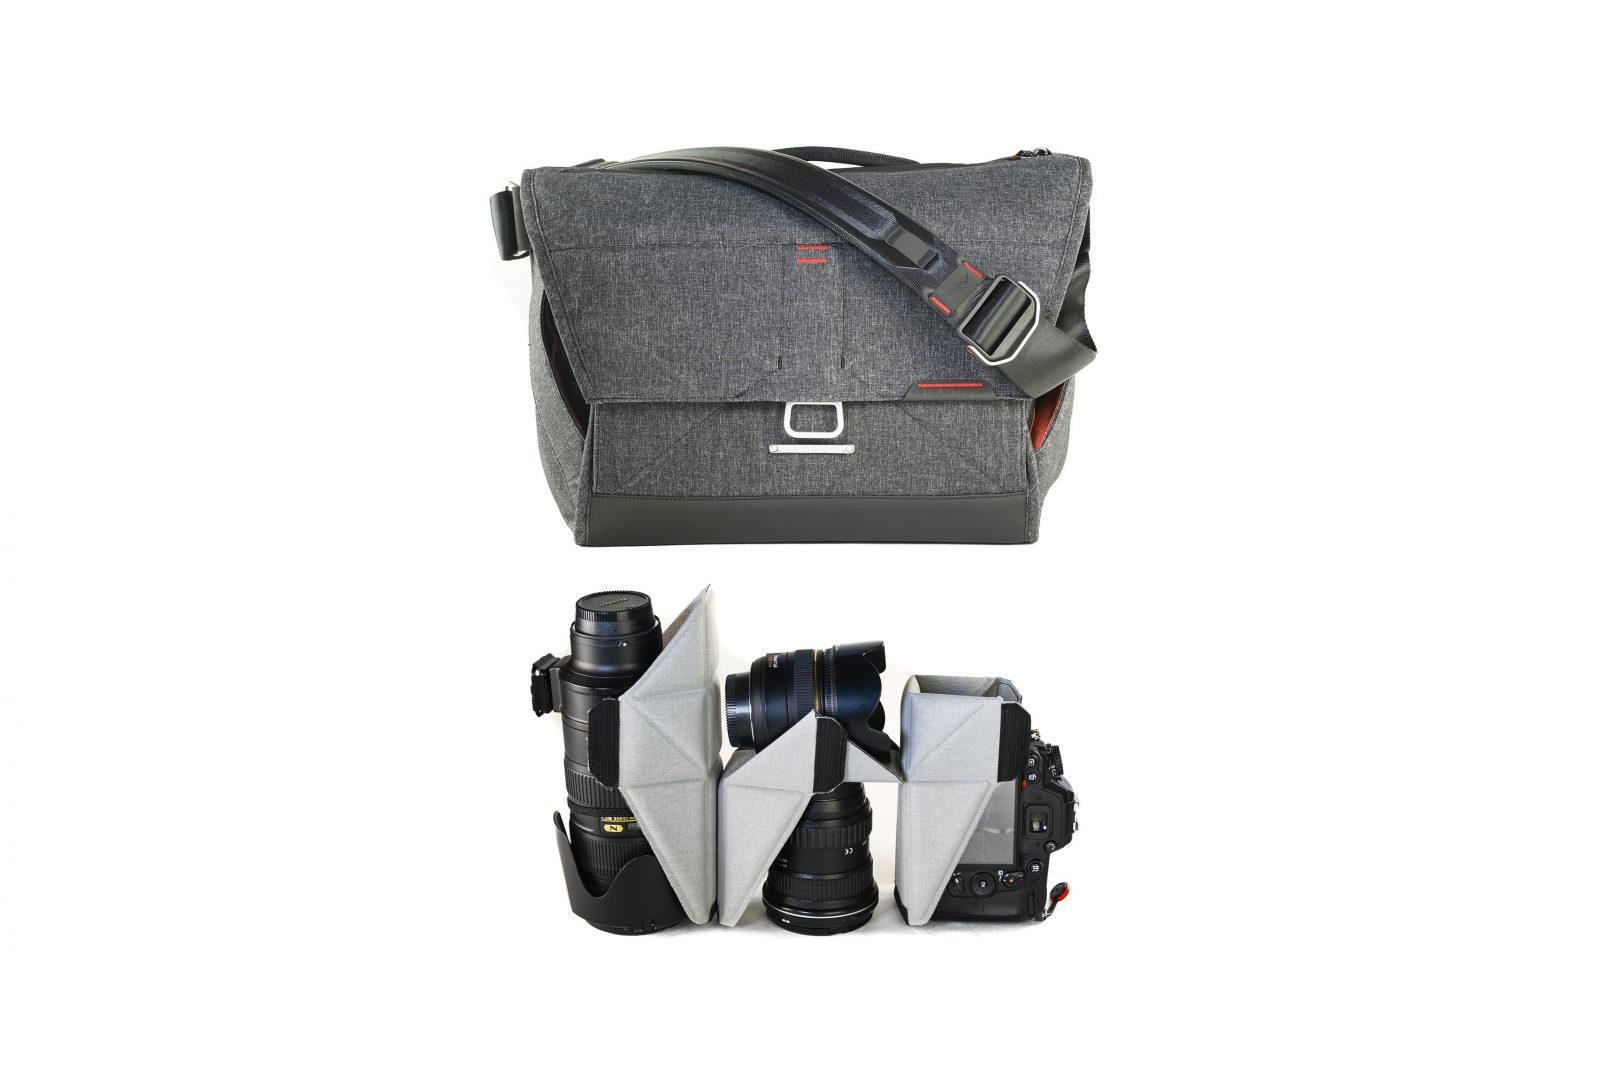 Everyday Messenger Bag Peak Design 1600x1085 - The Everyday Messenger Bag